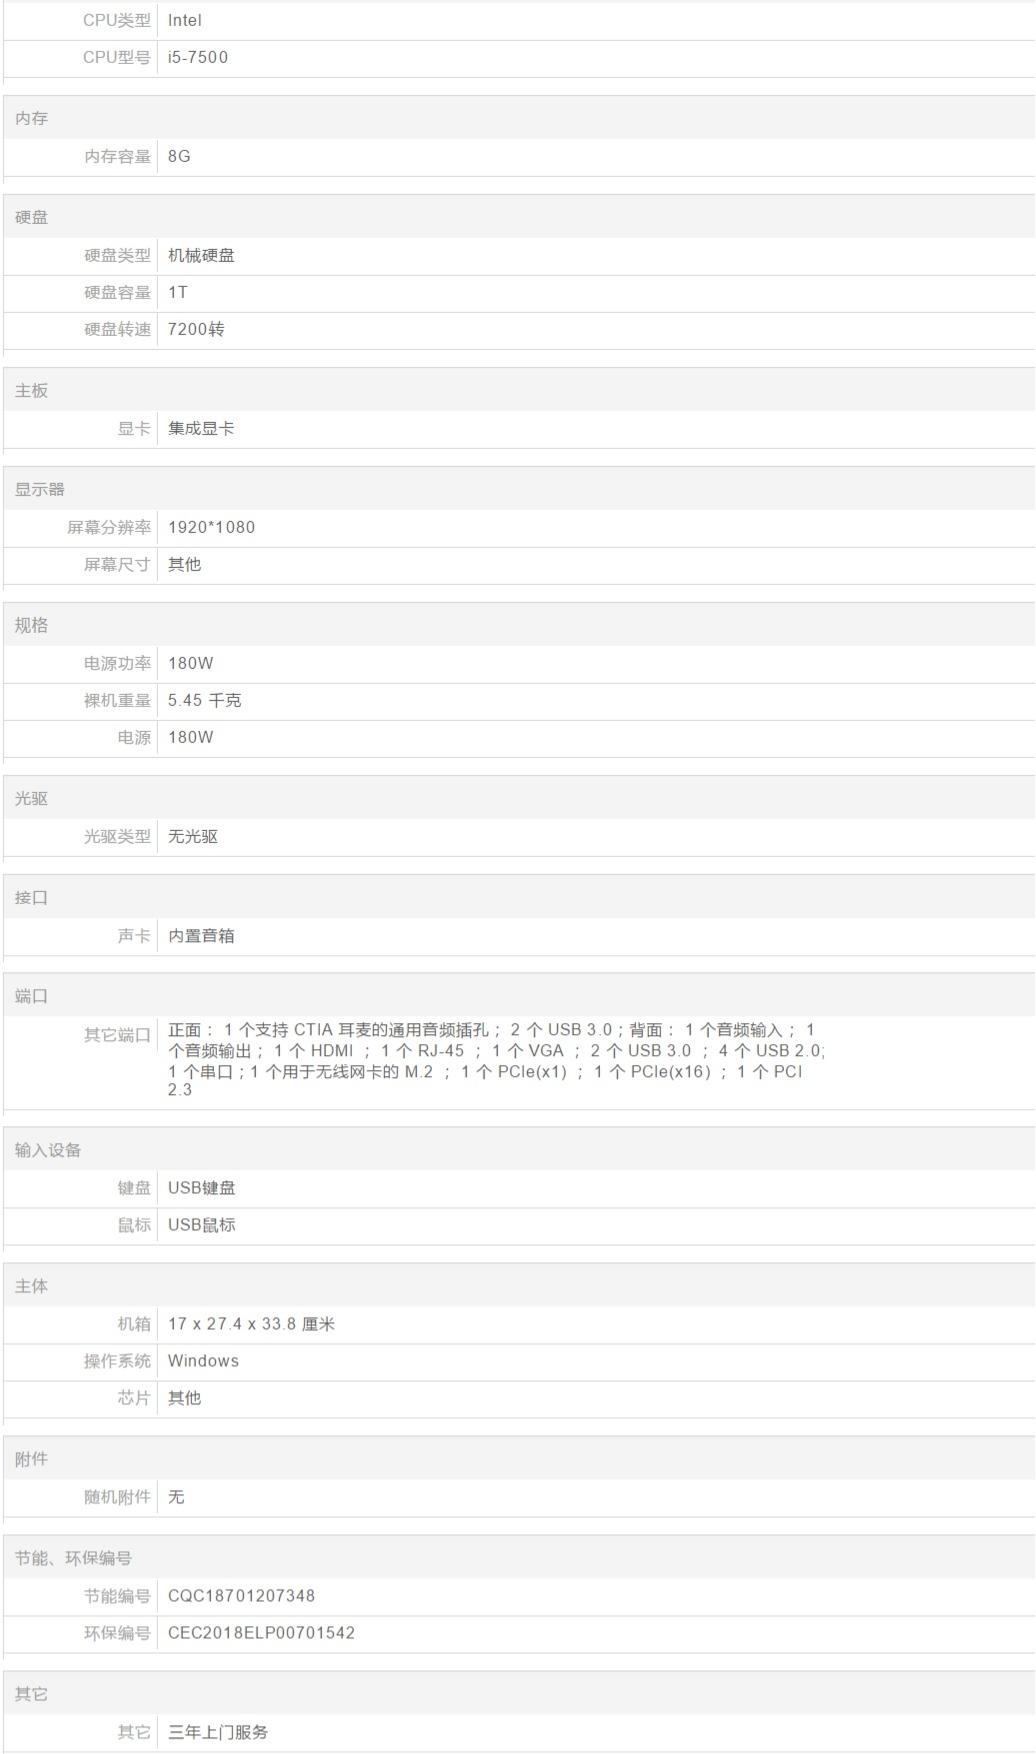 FireShot Capture 014 - 河南省政府采购网上商城_ - http___222.143.21.205_8081_product.jpg